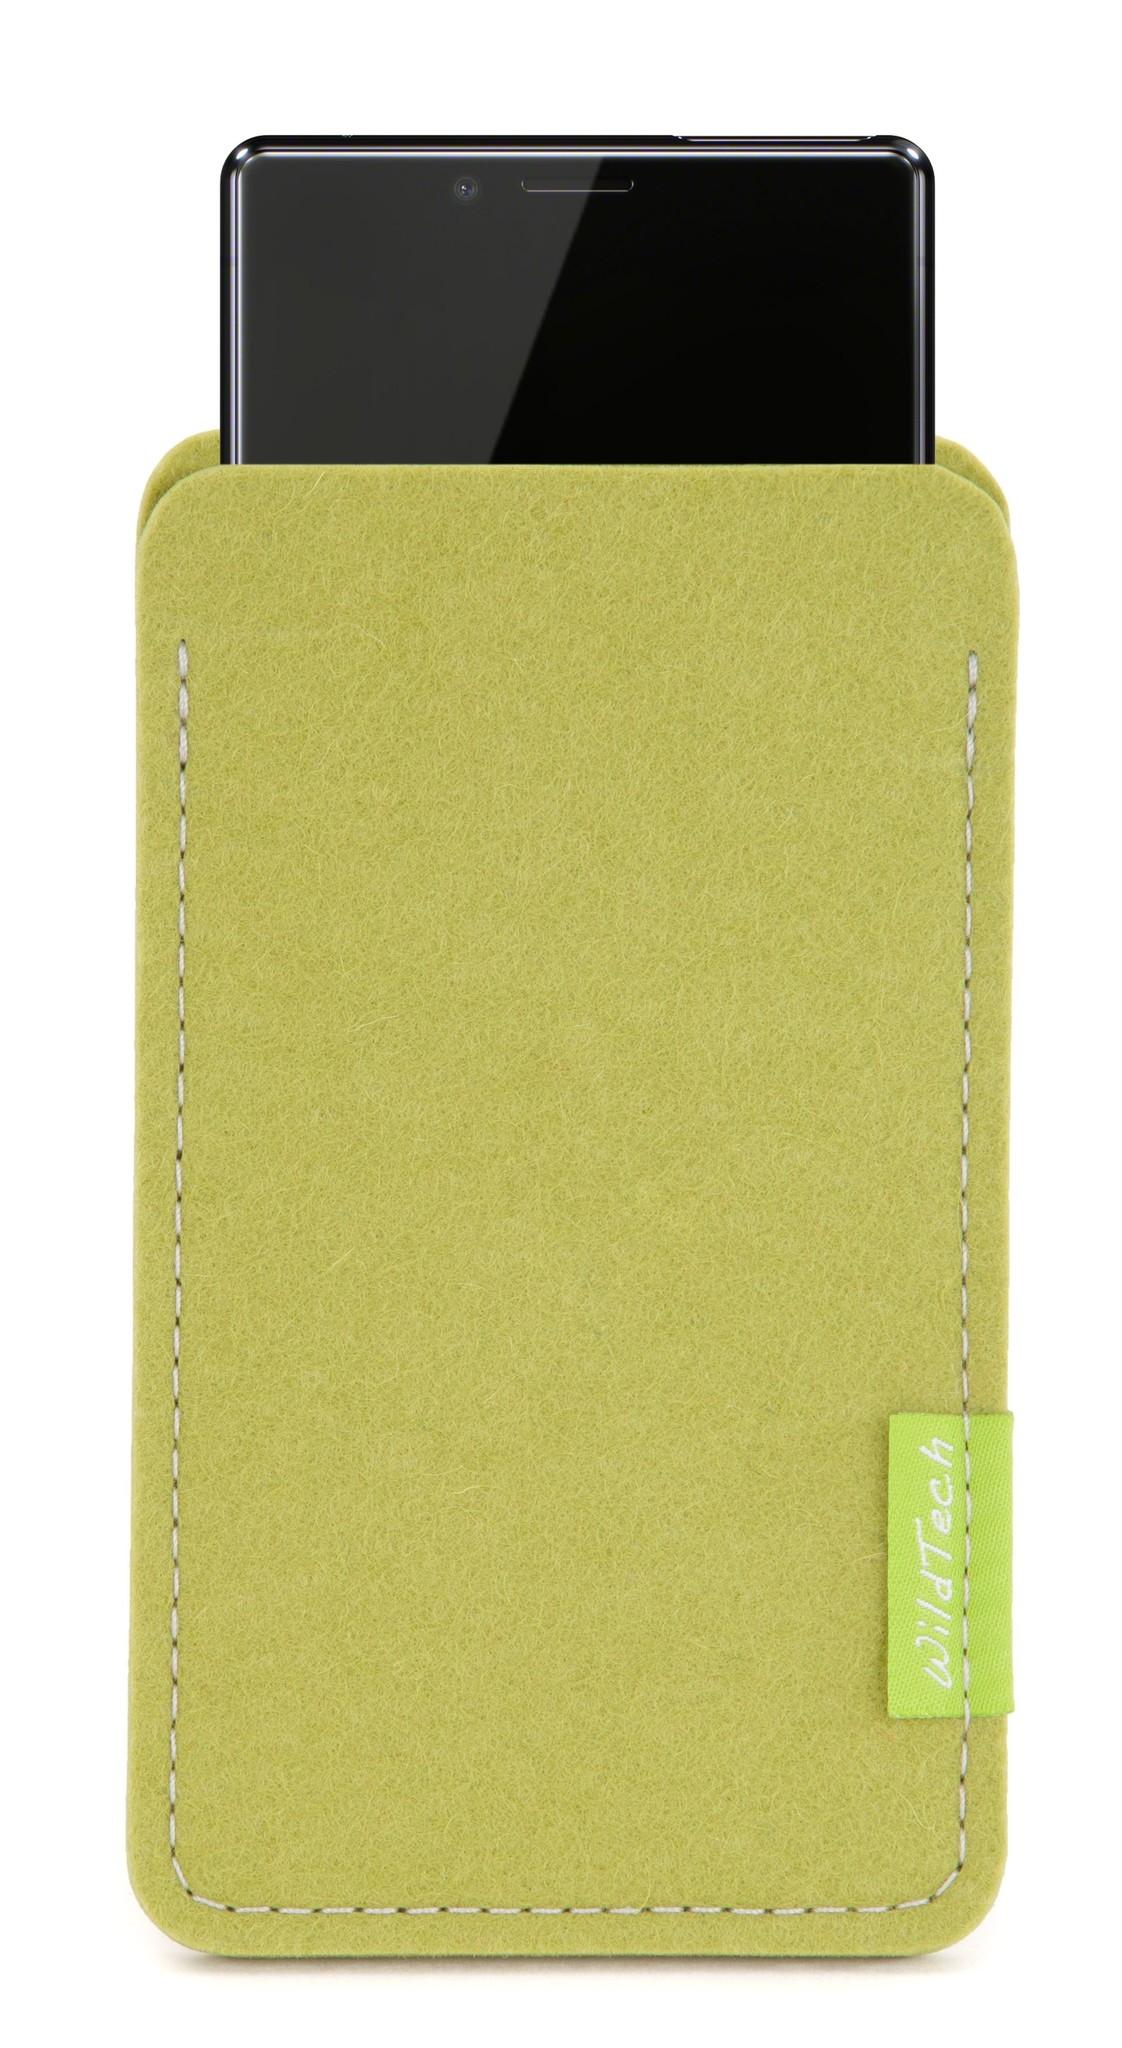 Xperia Sleeve Lime-Green-1